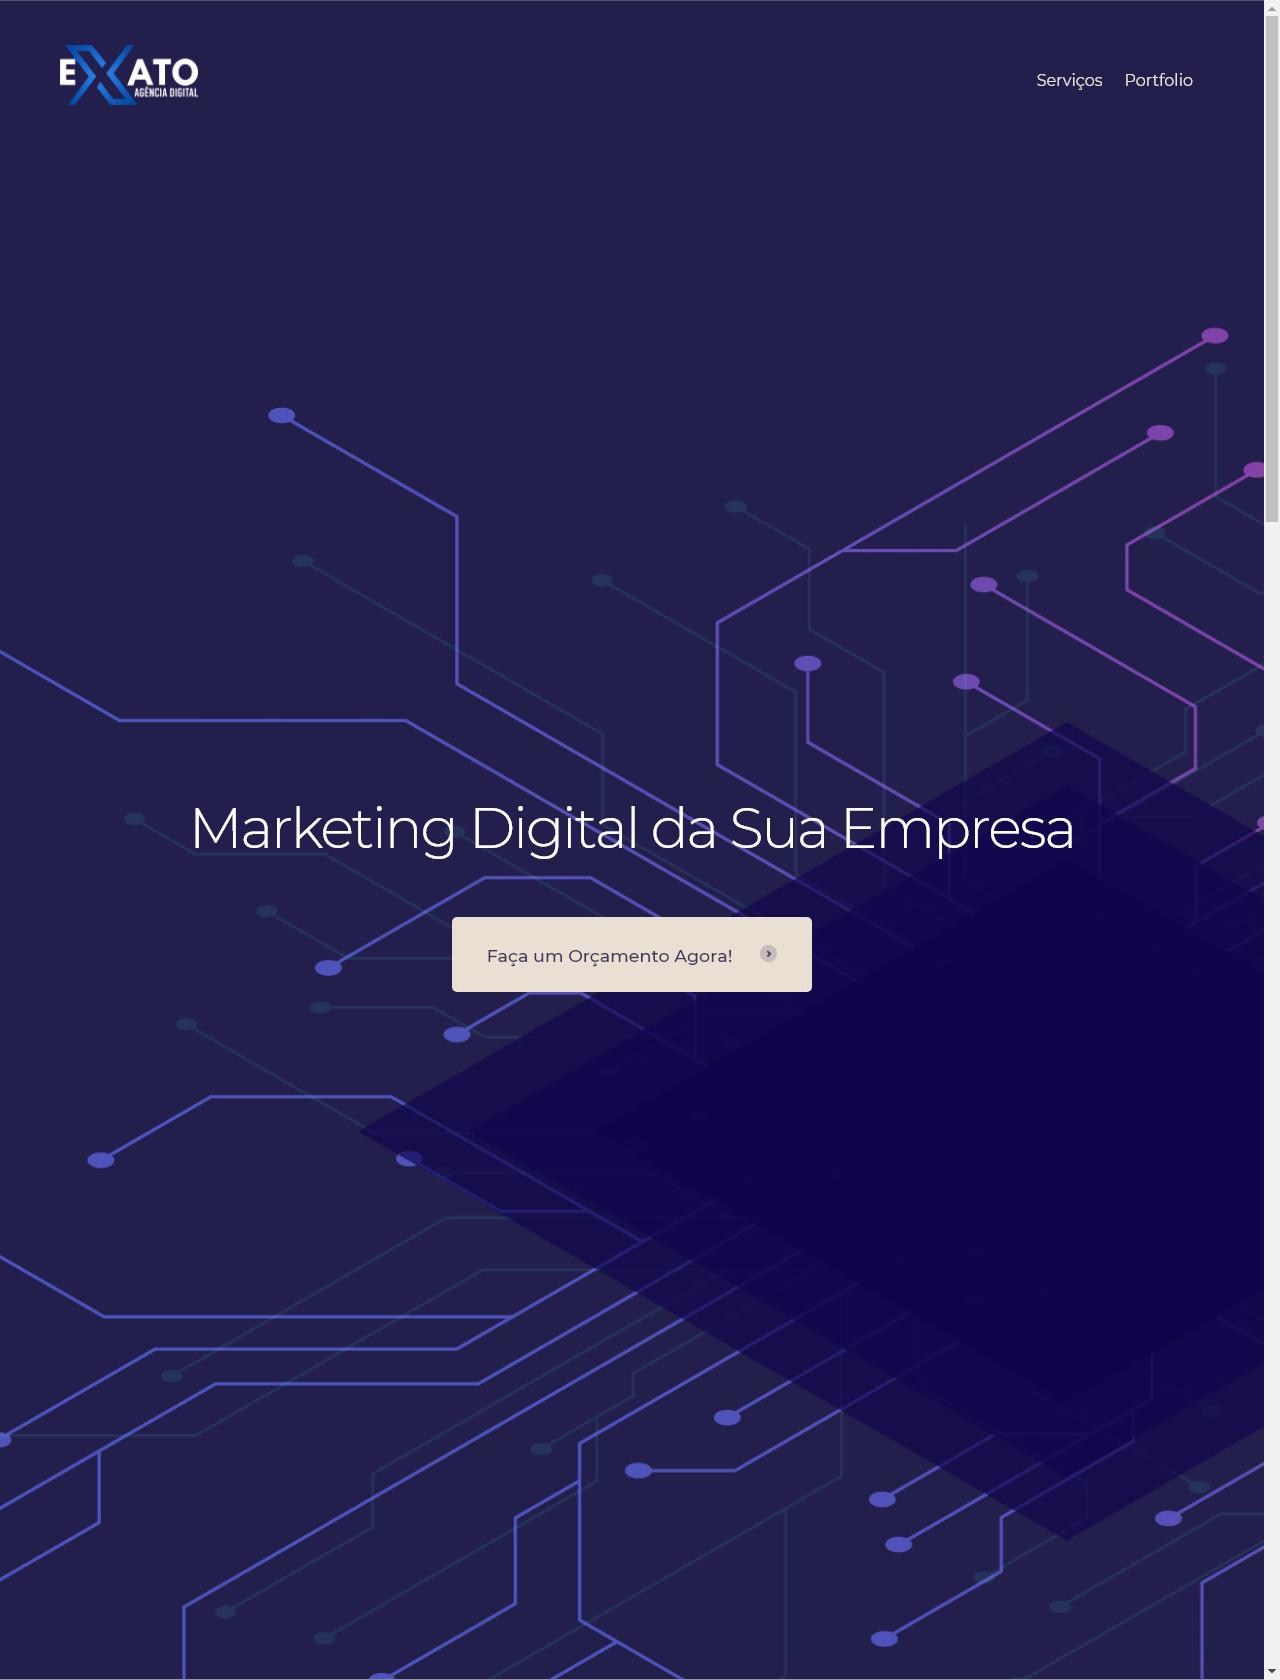 Screenshot Desktop - https://www.exatoagencia.com.br/